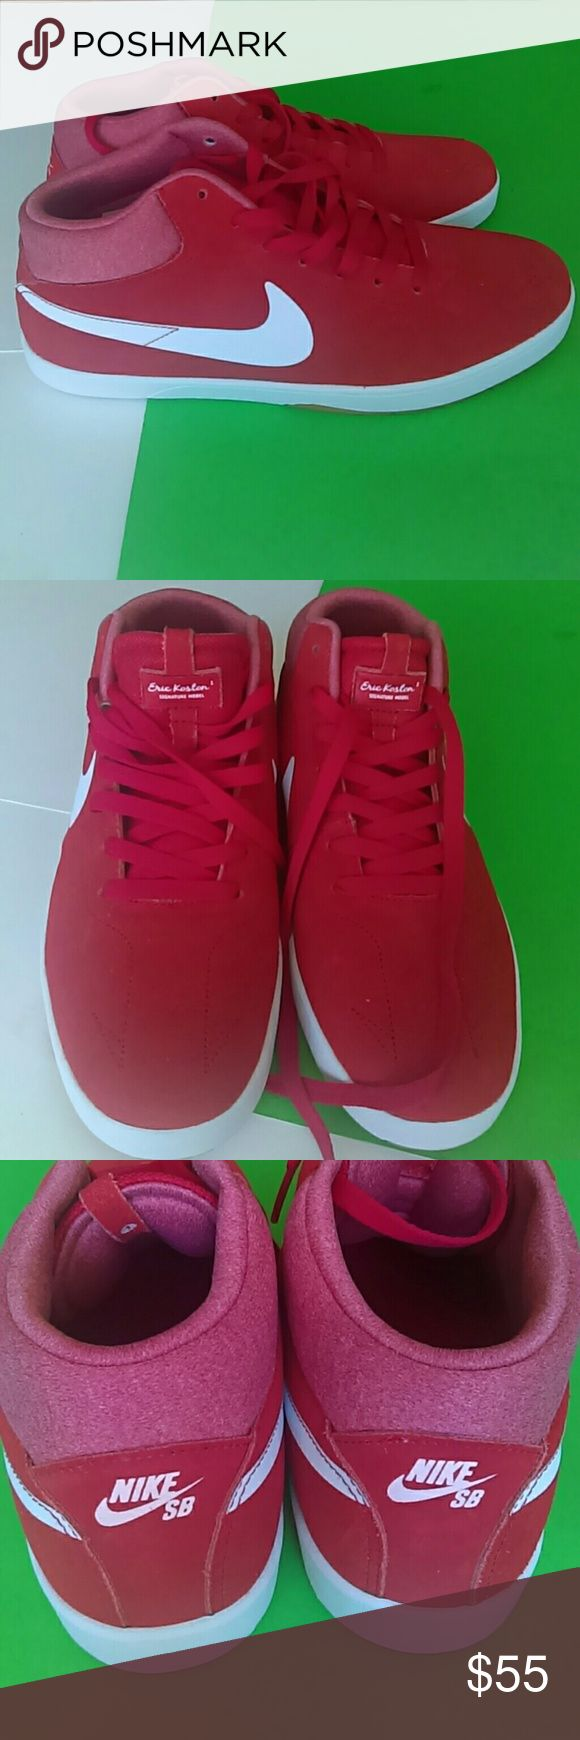 Nike men's Eric Koston Mid Brand new Eric Koston signature model Suede fabric Nike Shoes Sneakers